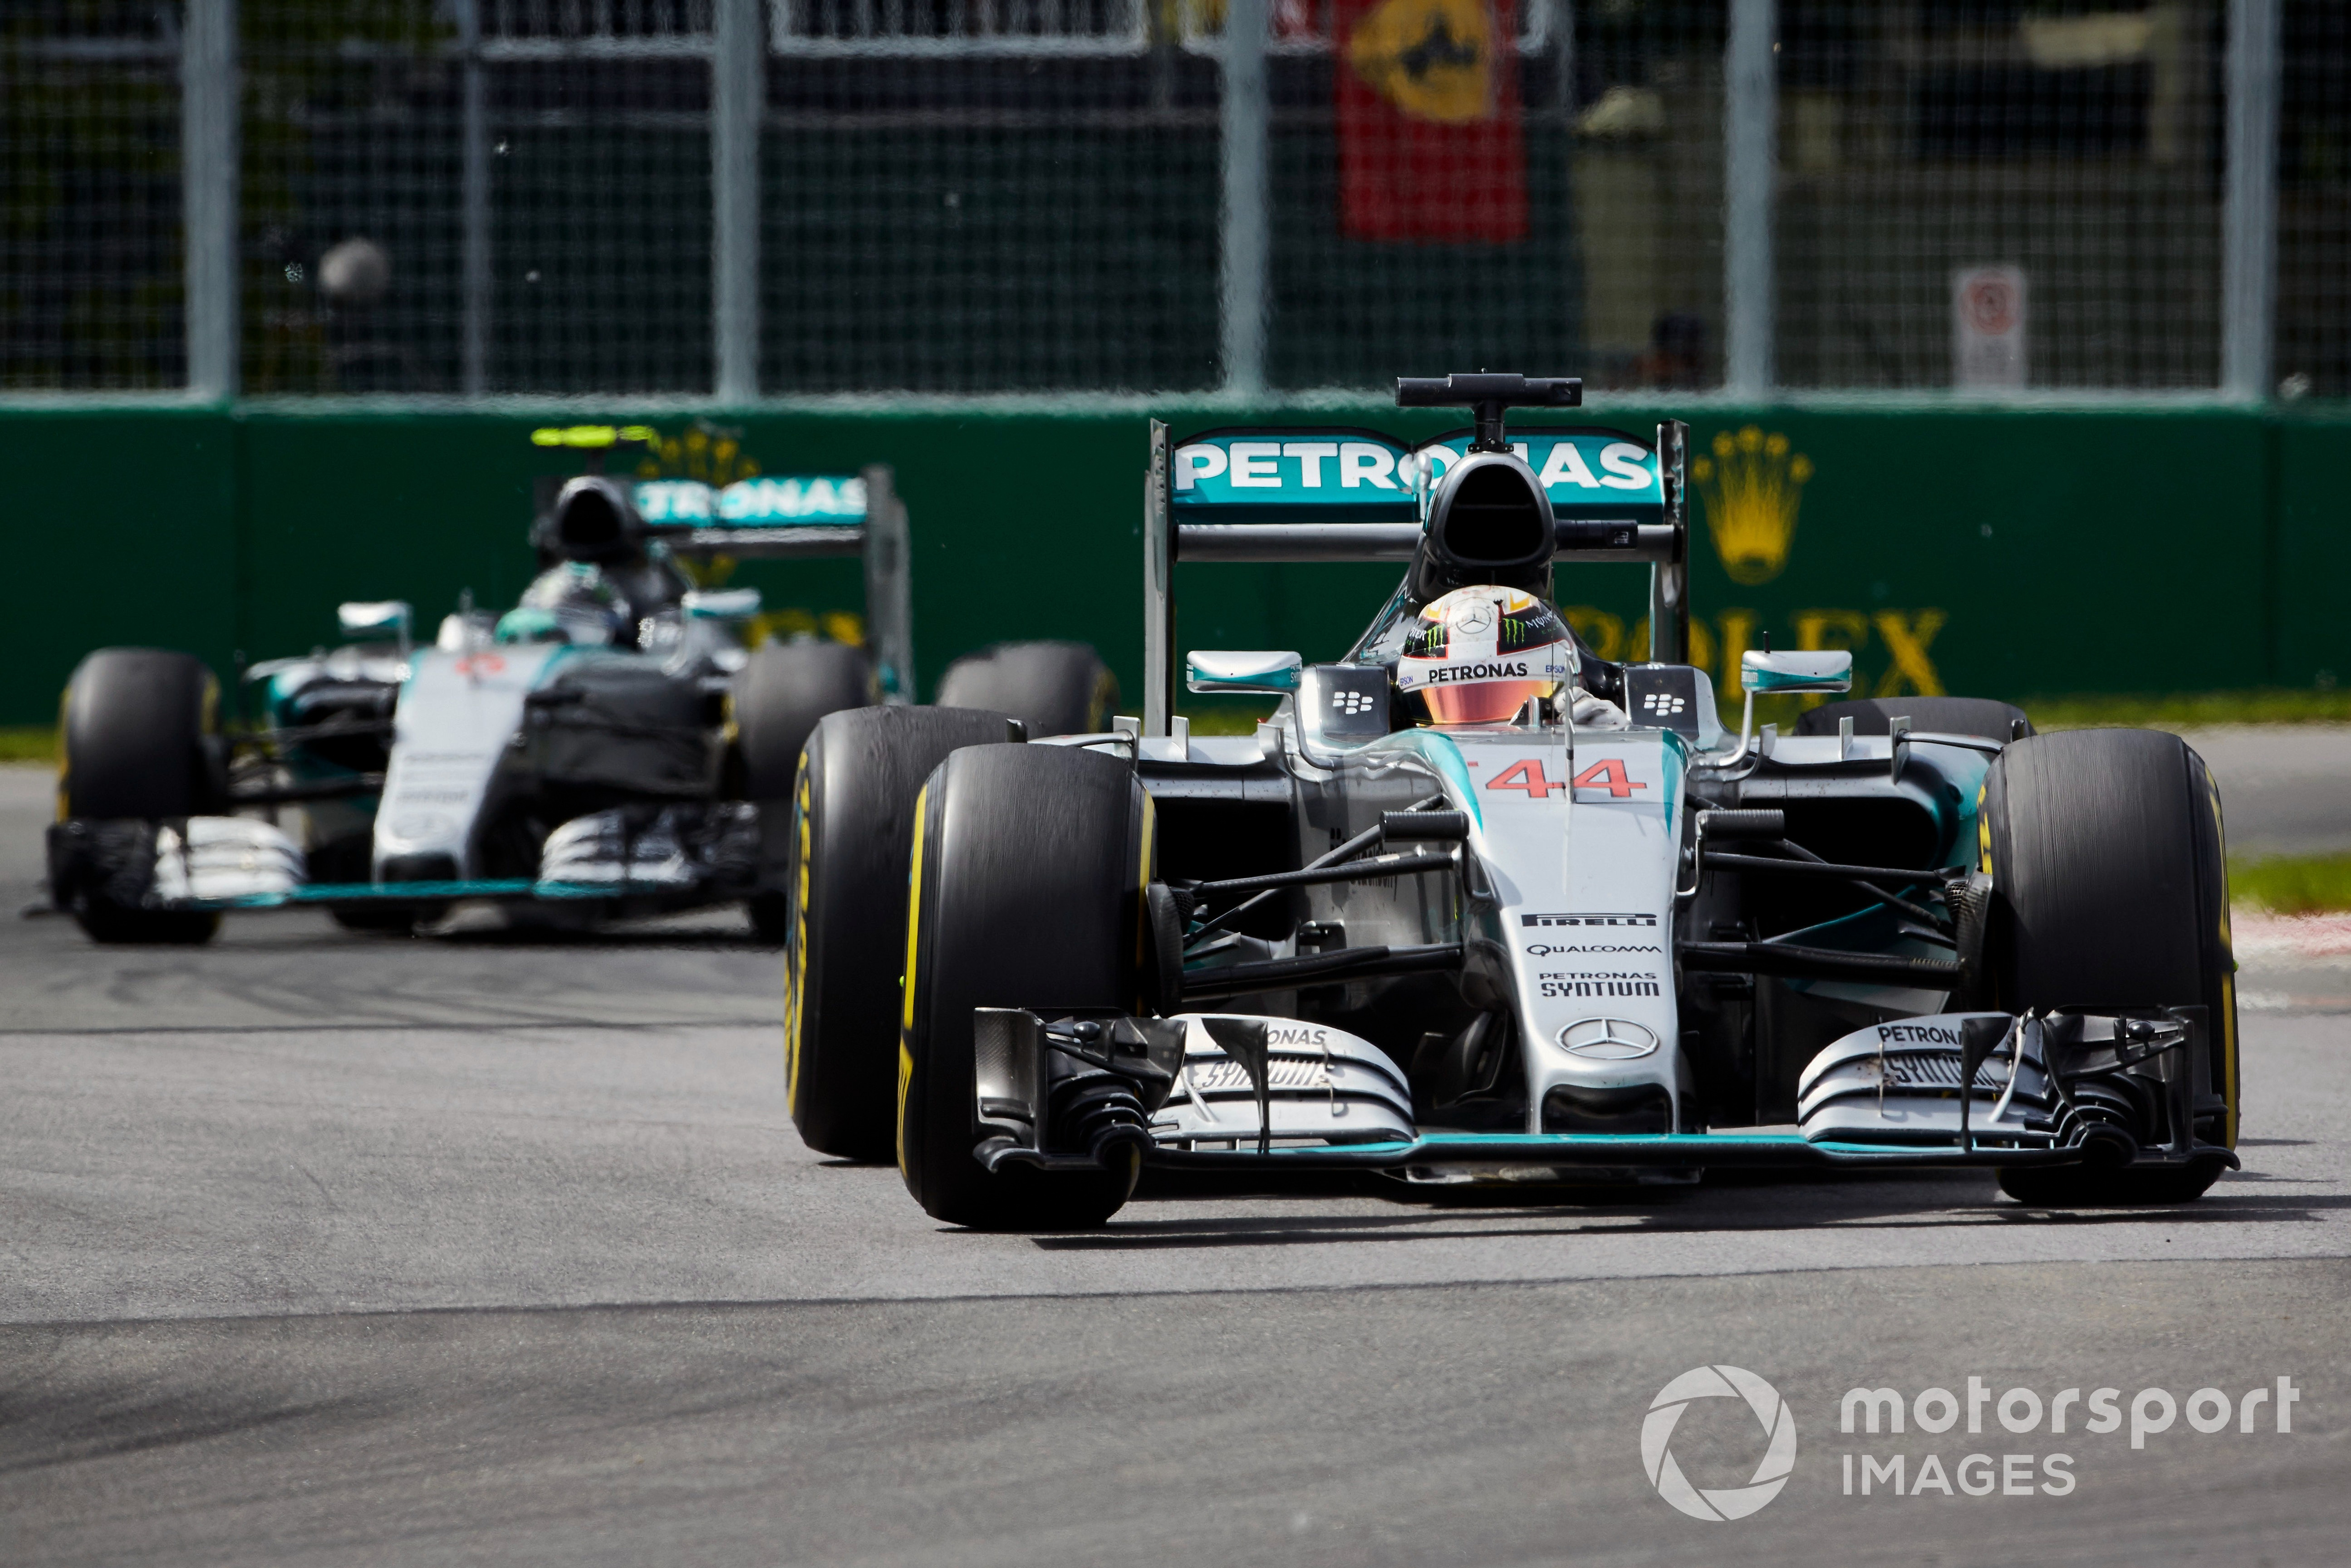 Lewis Hamilton, 2015 Canadian GP